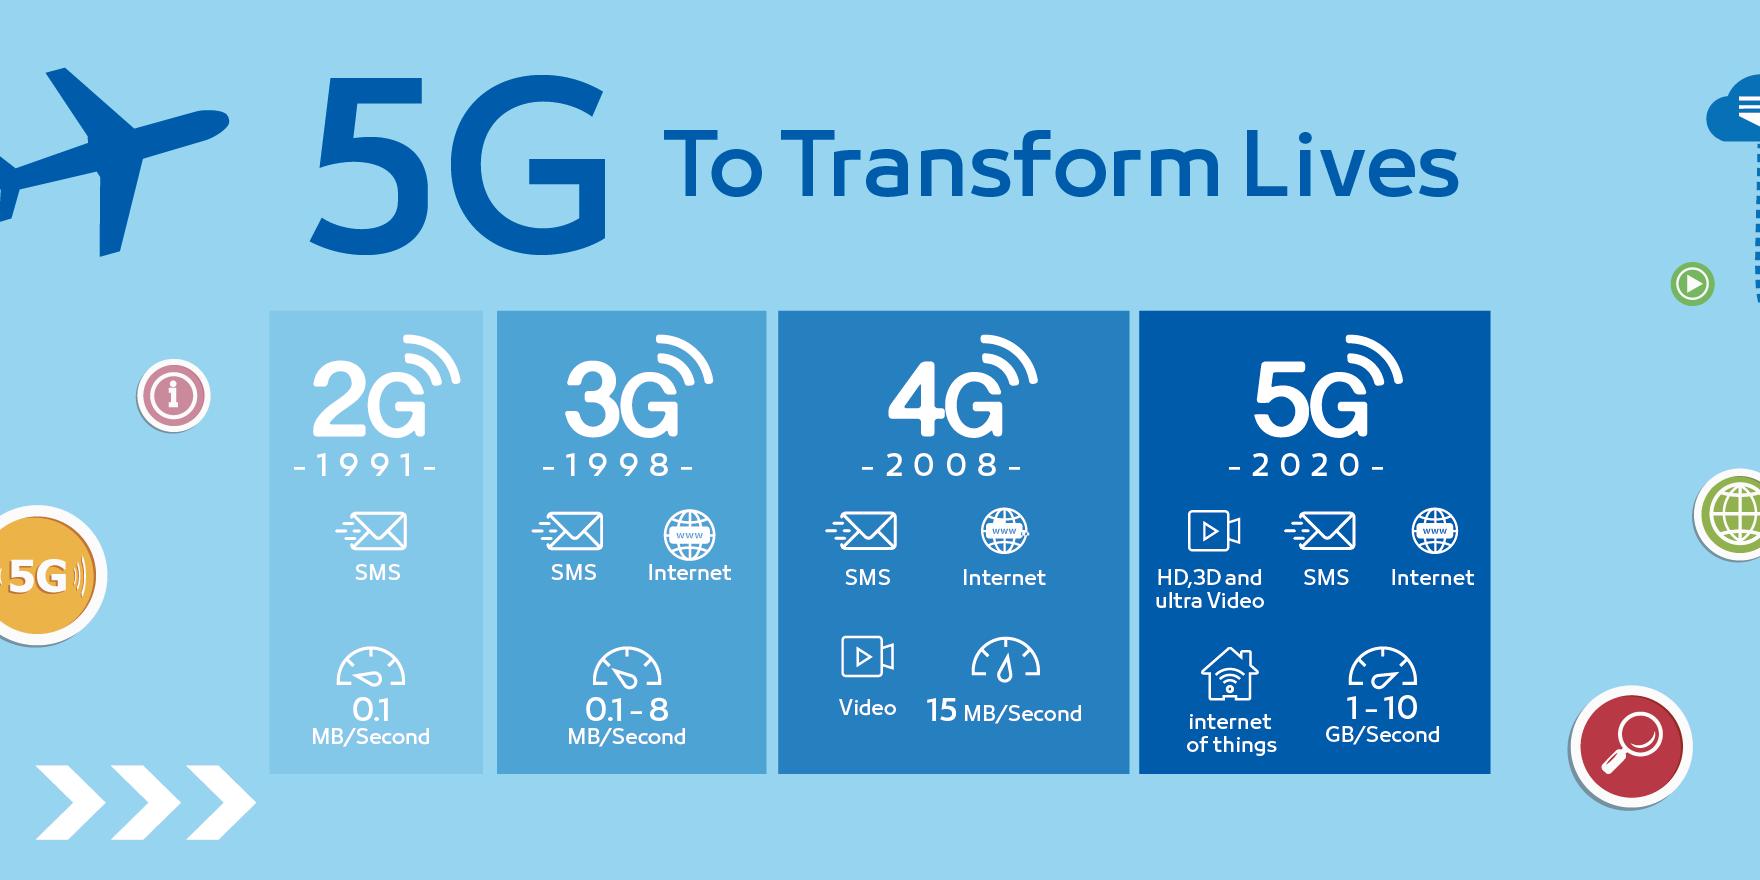 5G-To-Transforms-Lives-1760x880